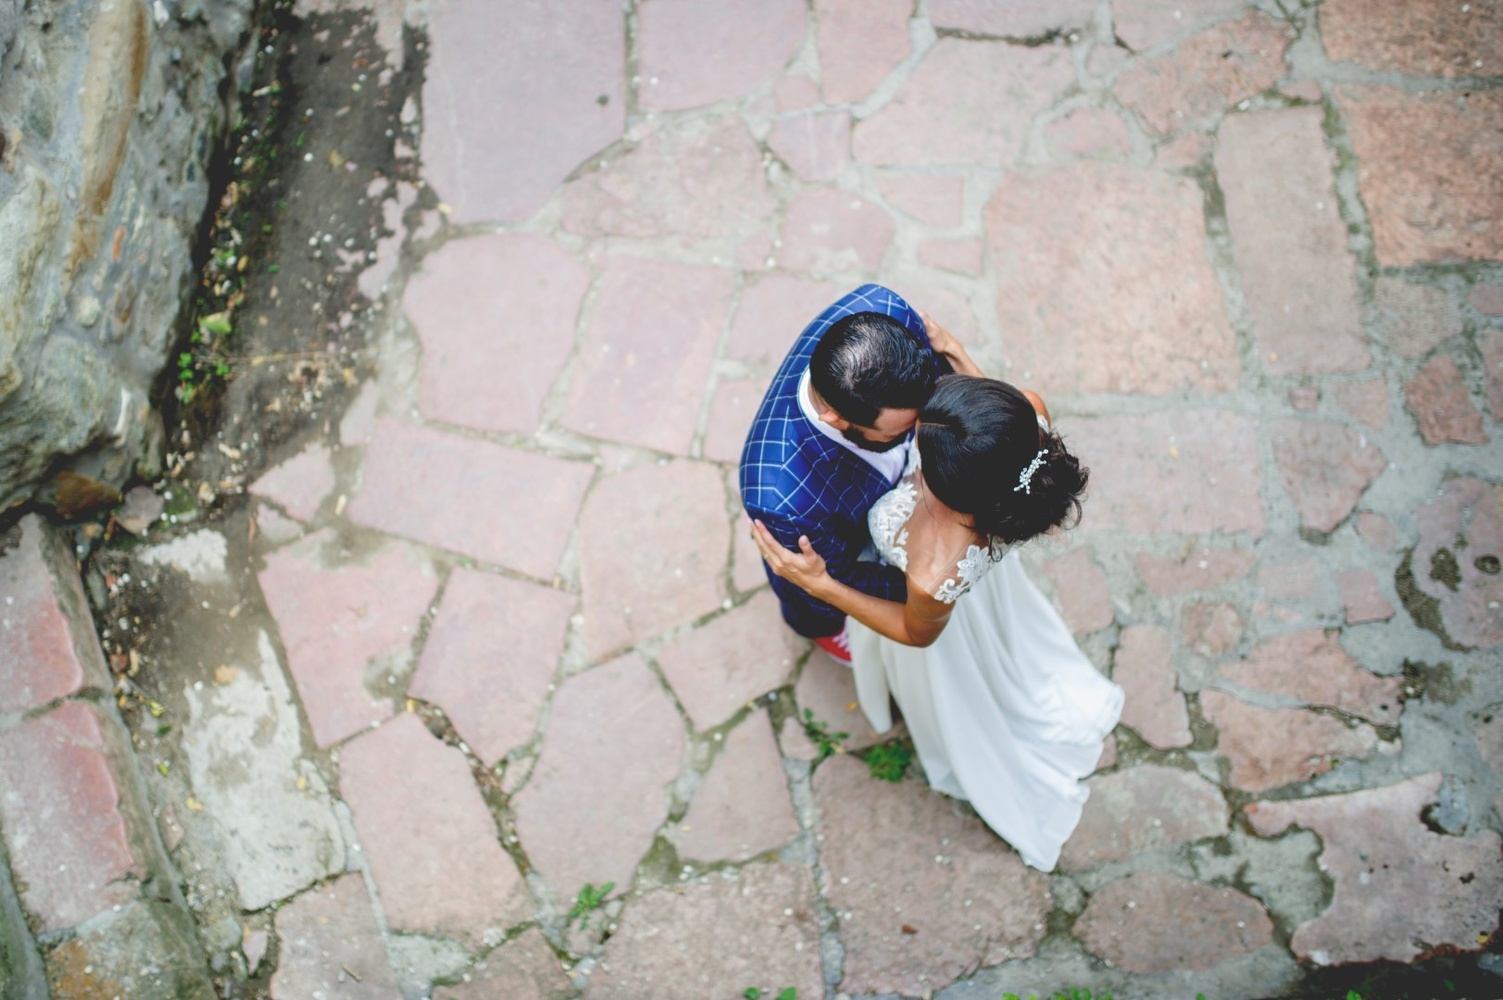 http://www.fotoz.sk/images/gallery-10/normal/eskuvoi-fotozas_svadobne-fotenie_920.jpg